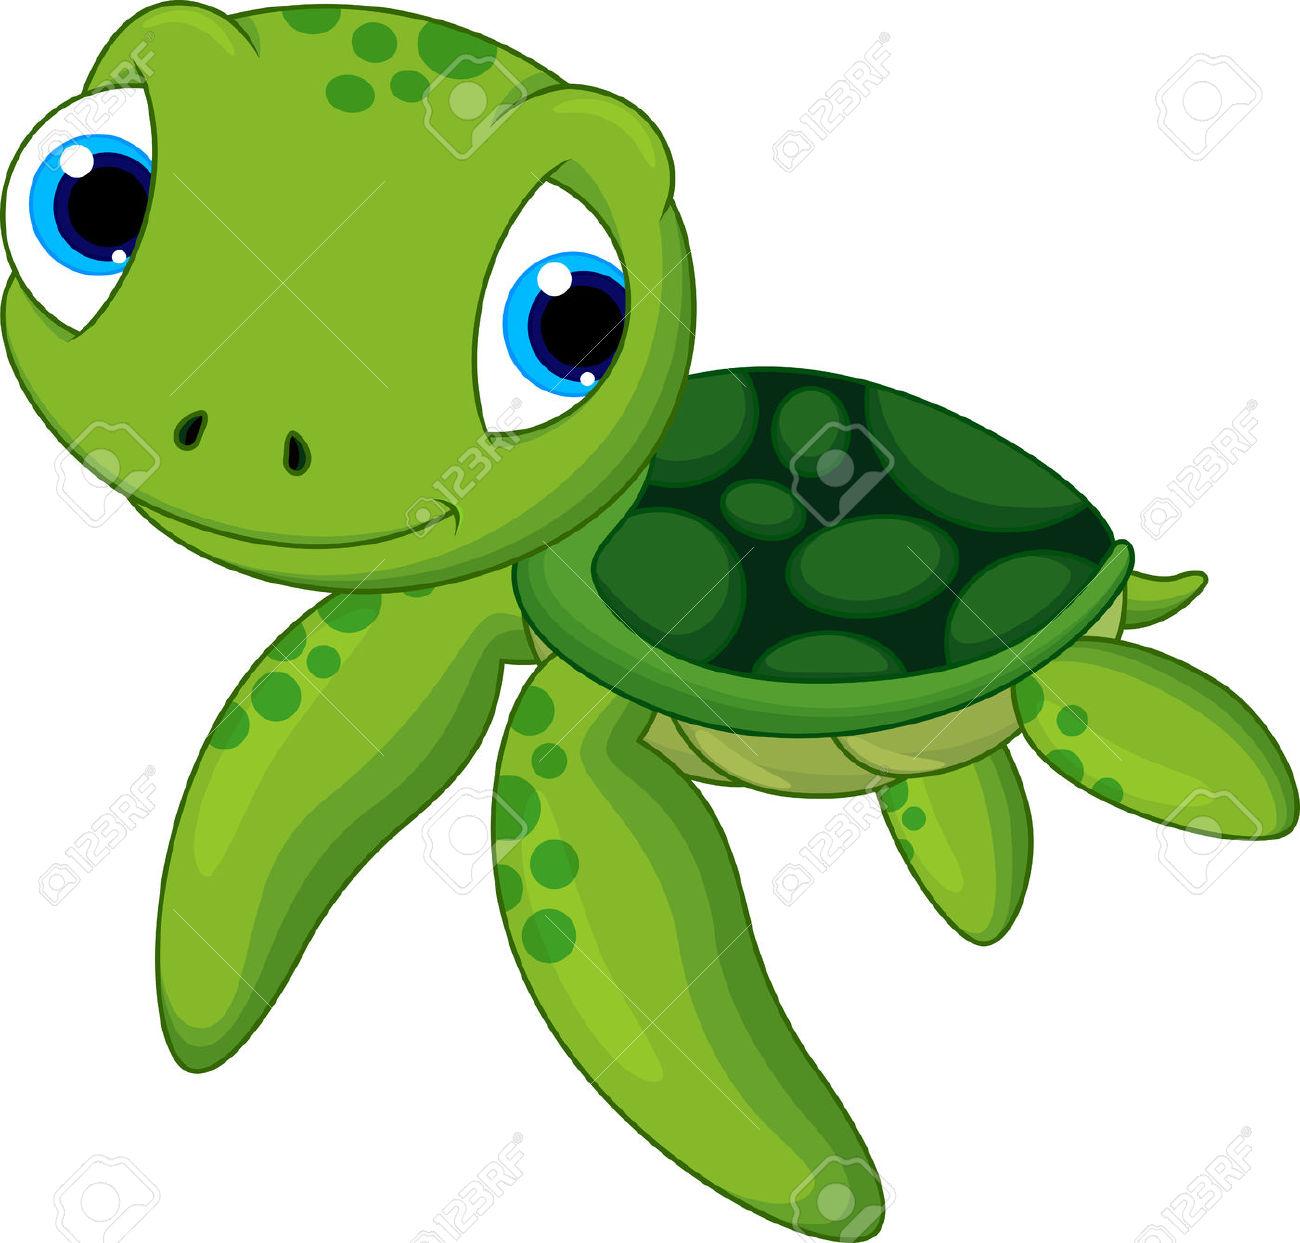 Sea Turtle Clipart & Sea Turtle Clip Art Images.